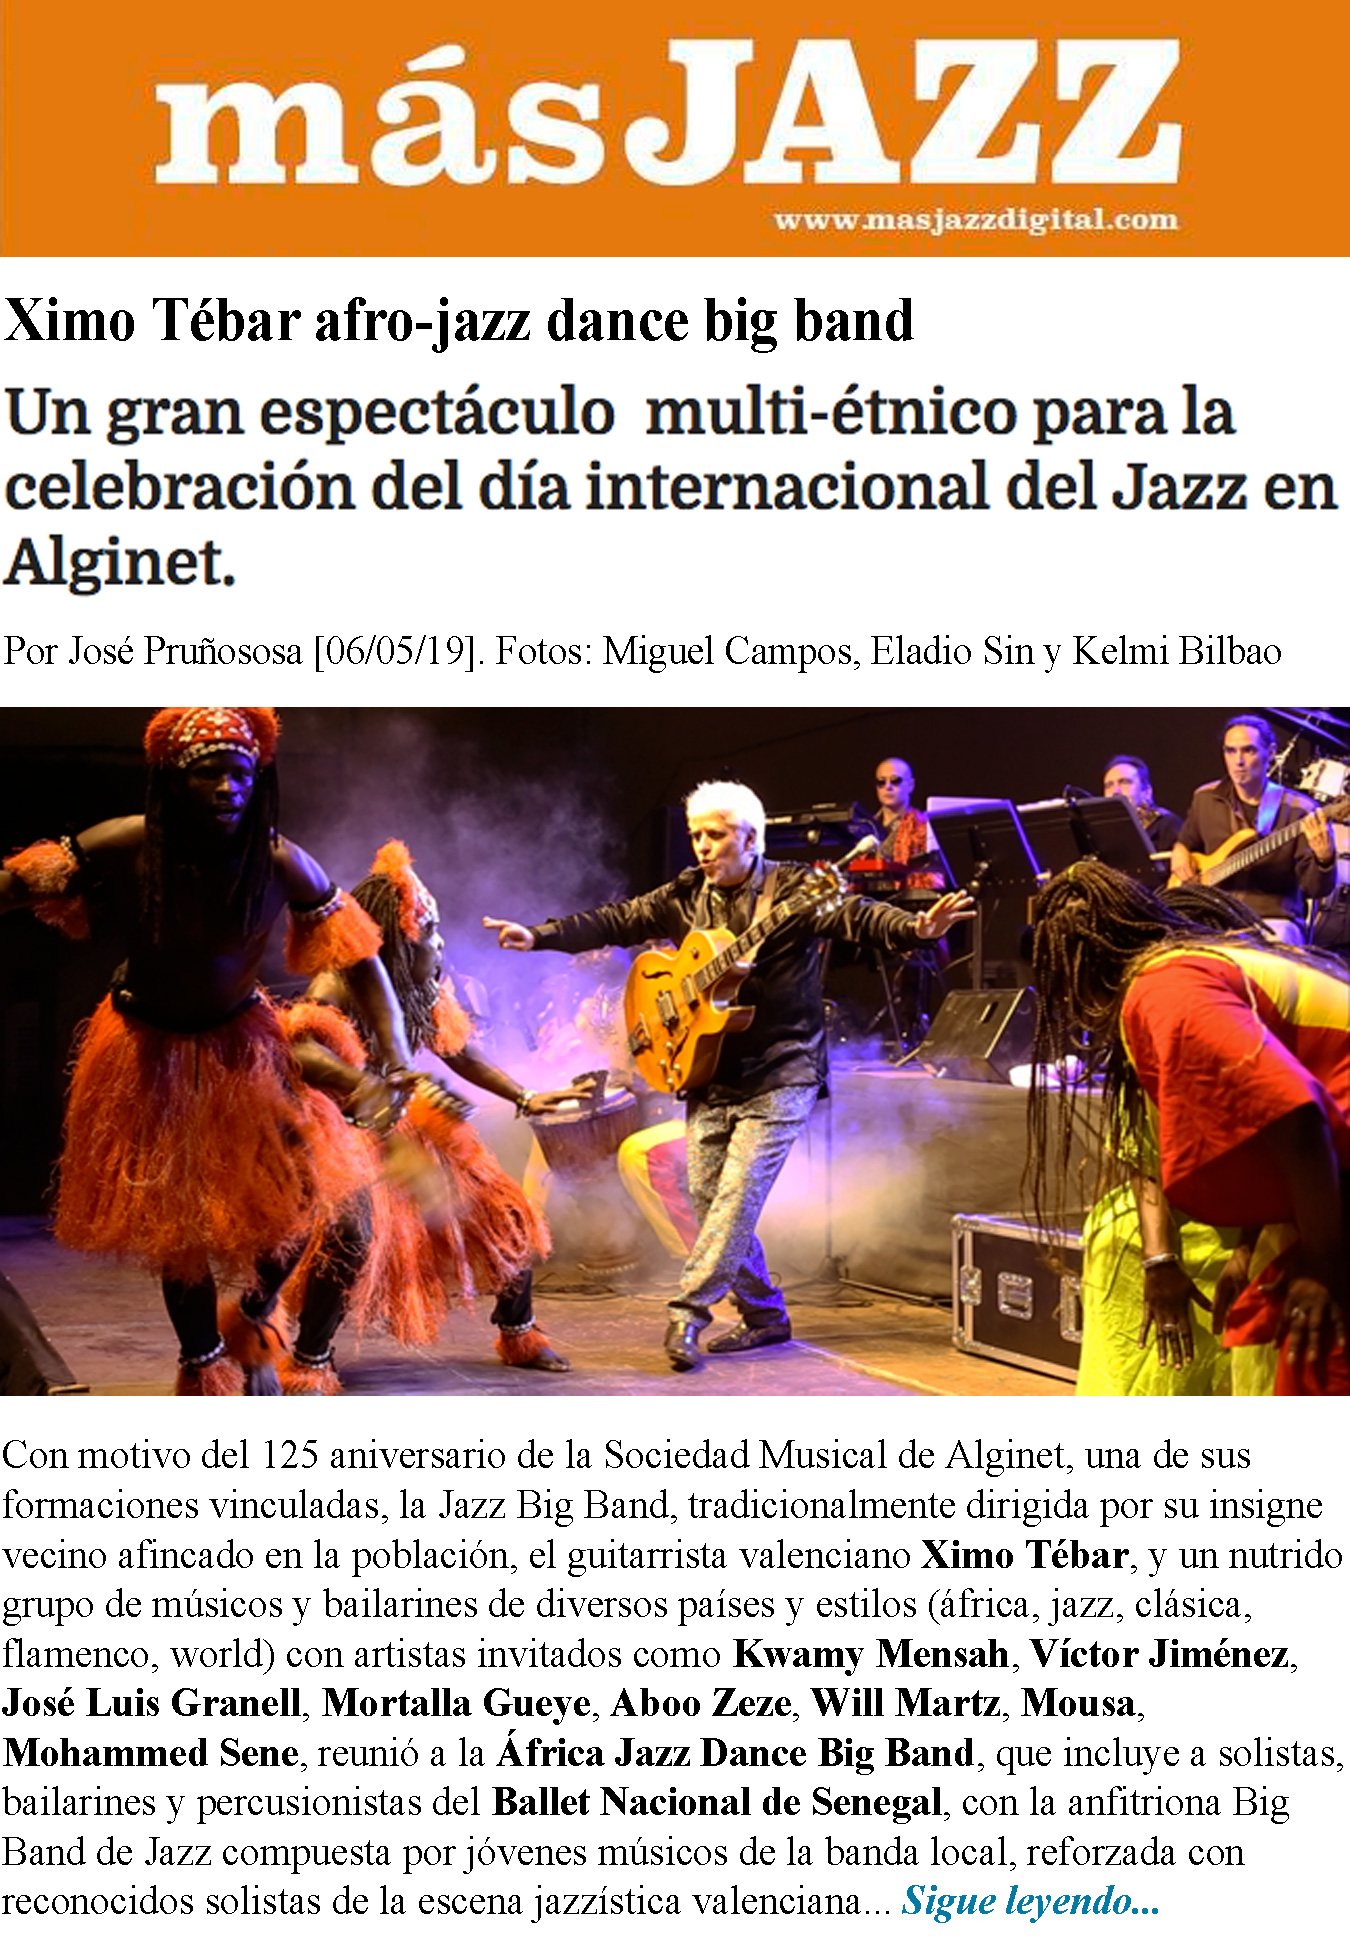 Mas-Jazz-Magazine-Ximo-Tebar-Africa-Jazz-Dance-Big-Band-International-Jazz-Day-2019-Review